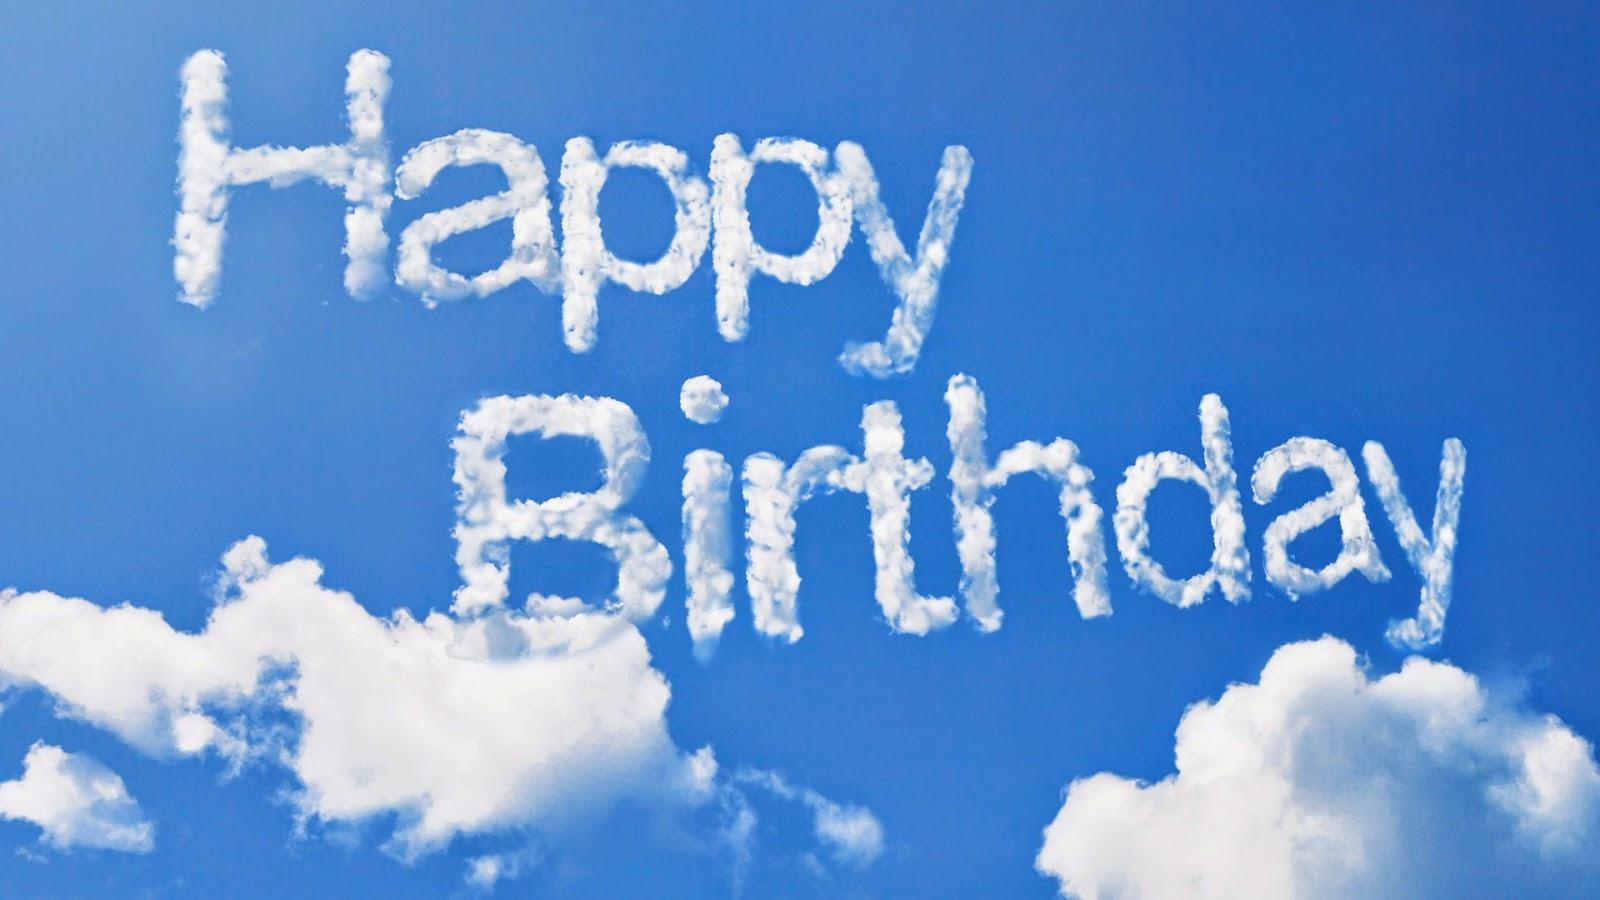 Every India Shayari Images 2017 Hindi Shayari Shayari In Pictures To Wish Happy Birthday